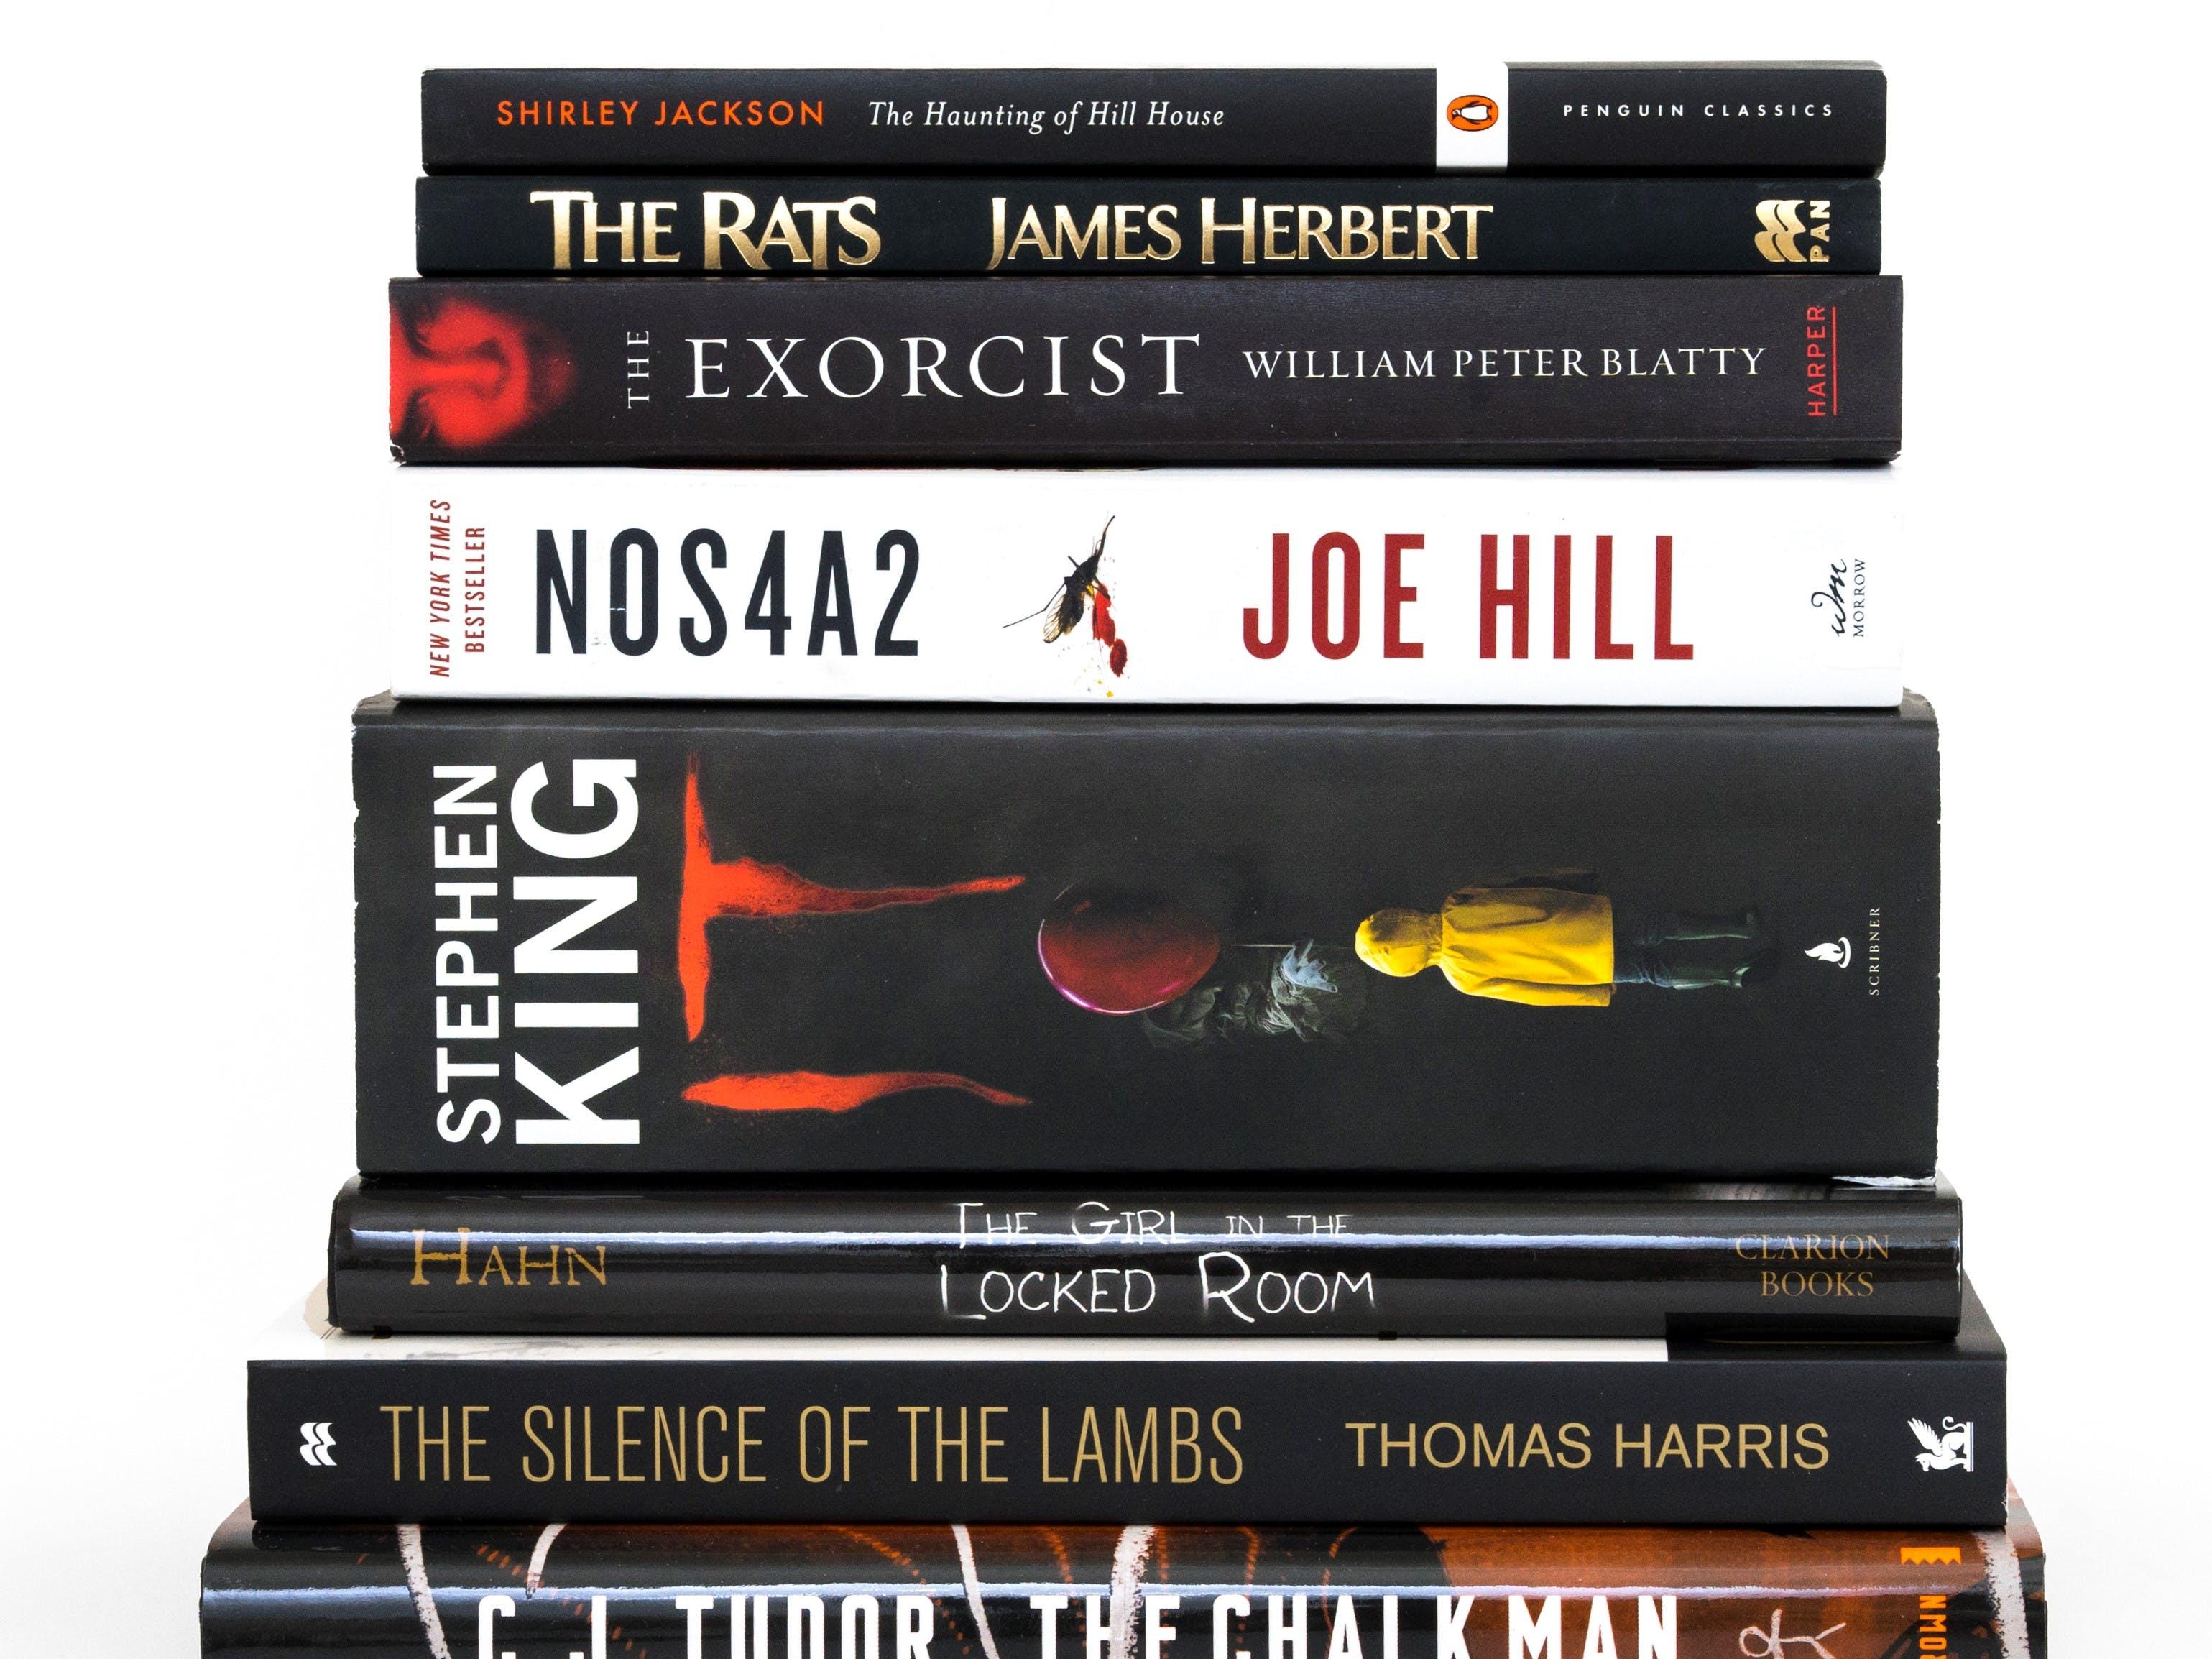 Bespoke Crime, Thriller & Horror Book Club by Book Club Guru